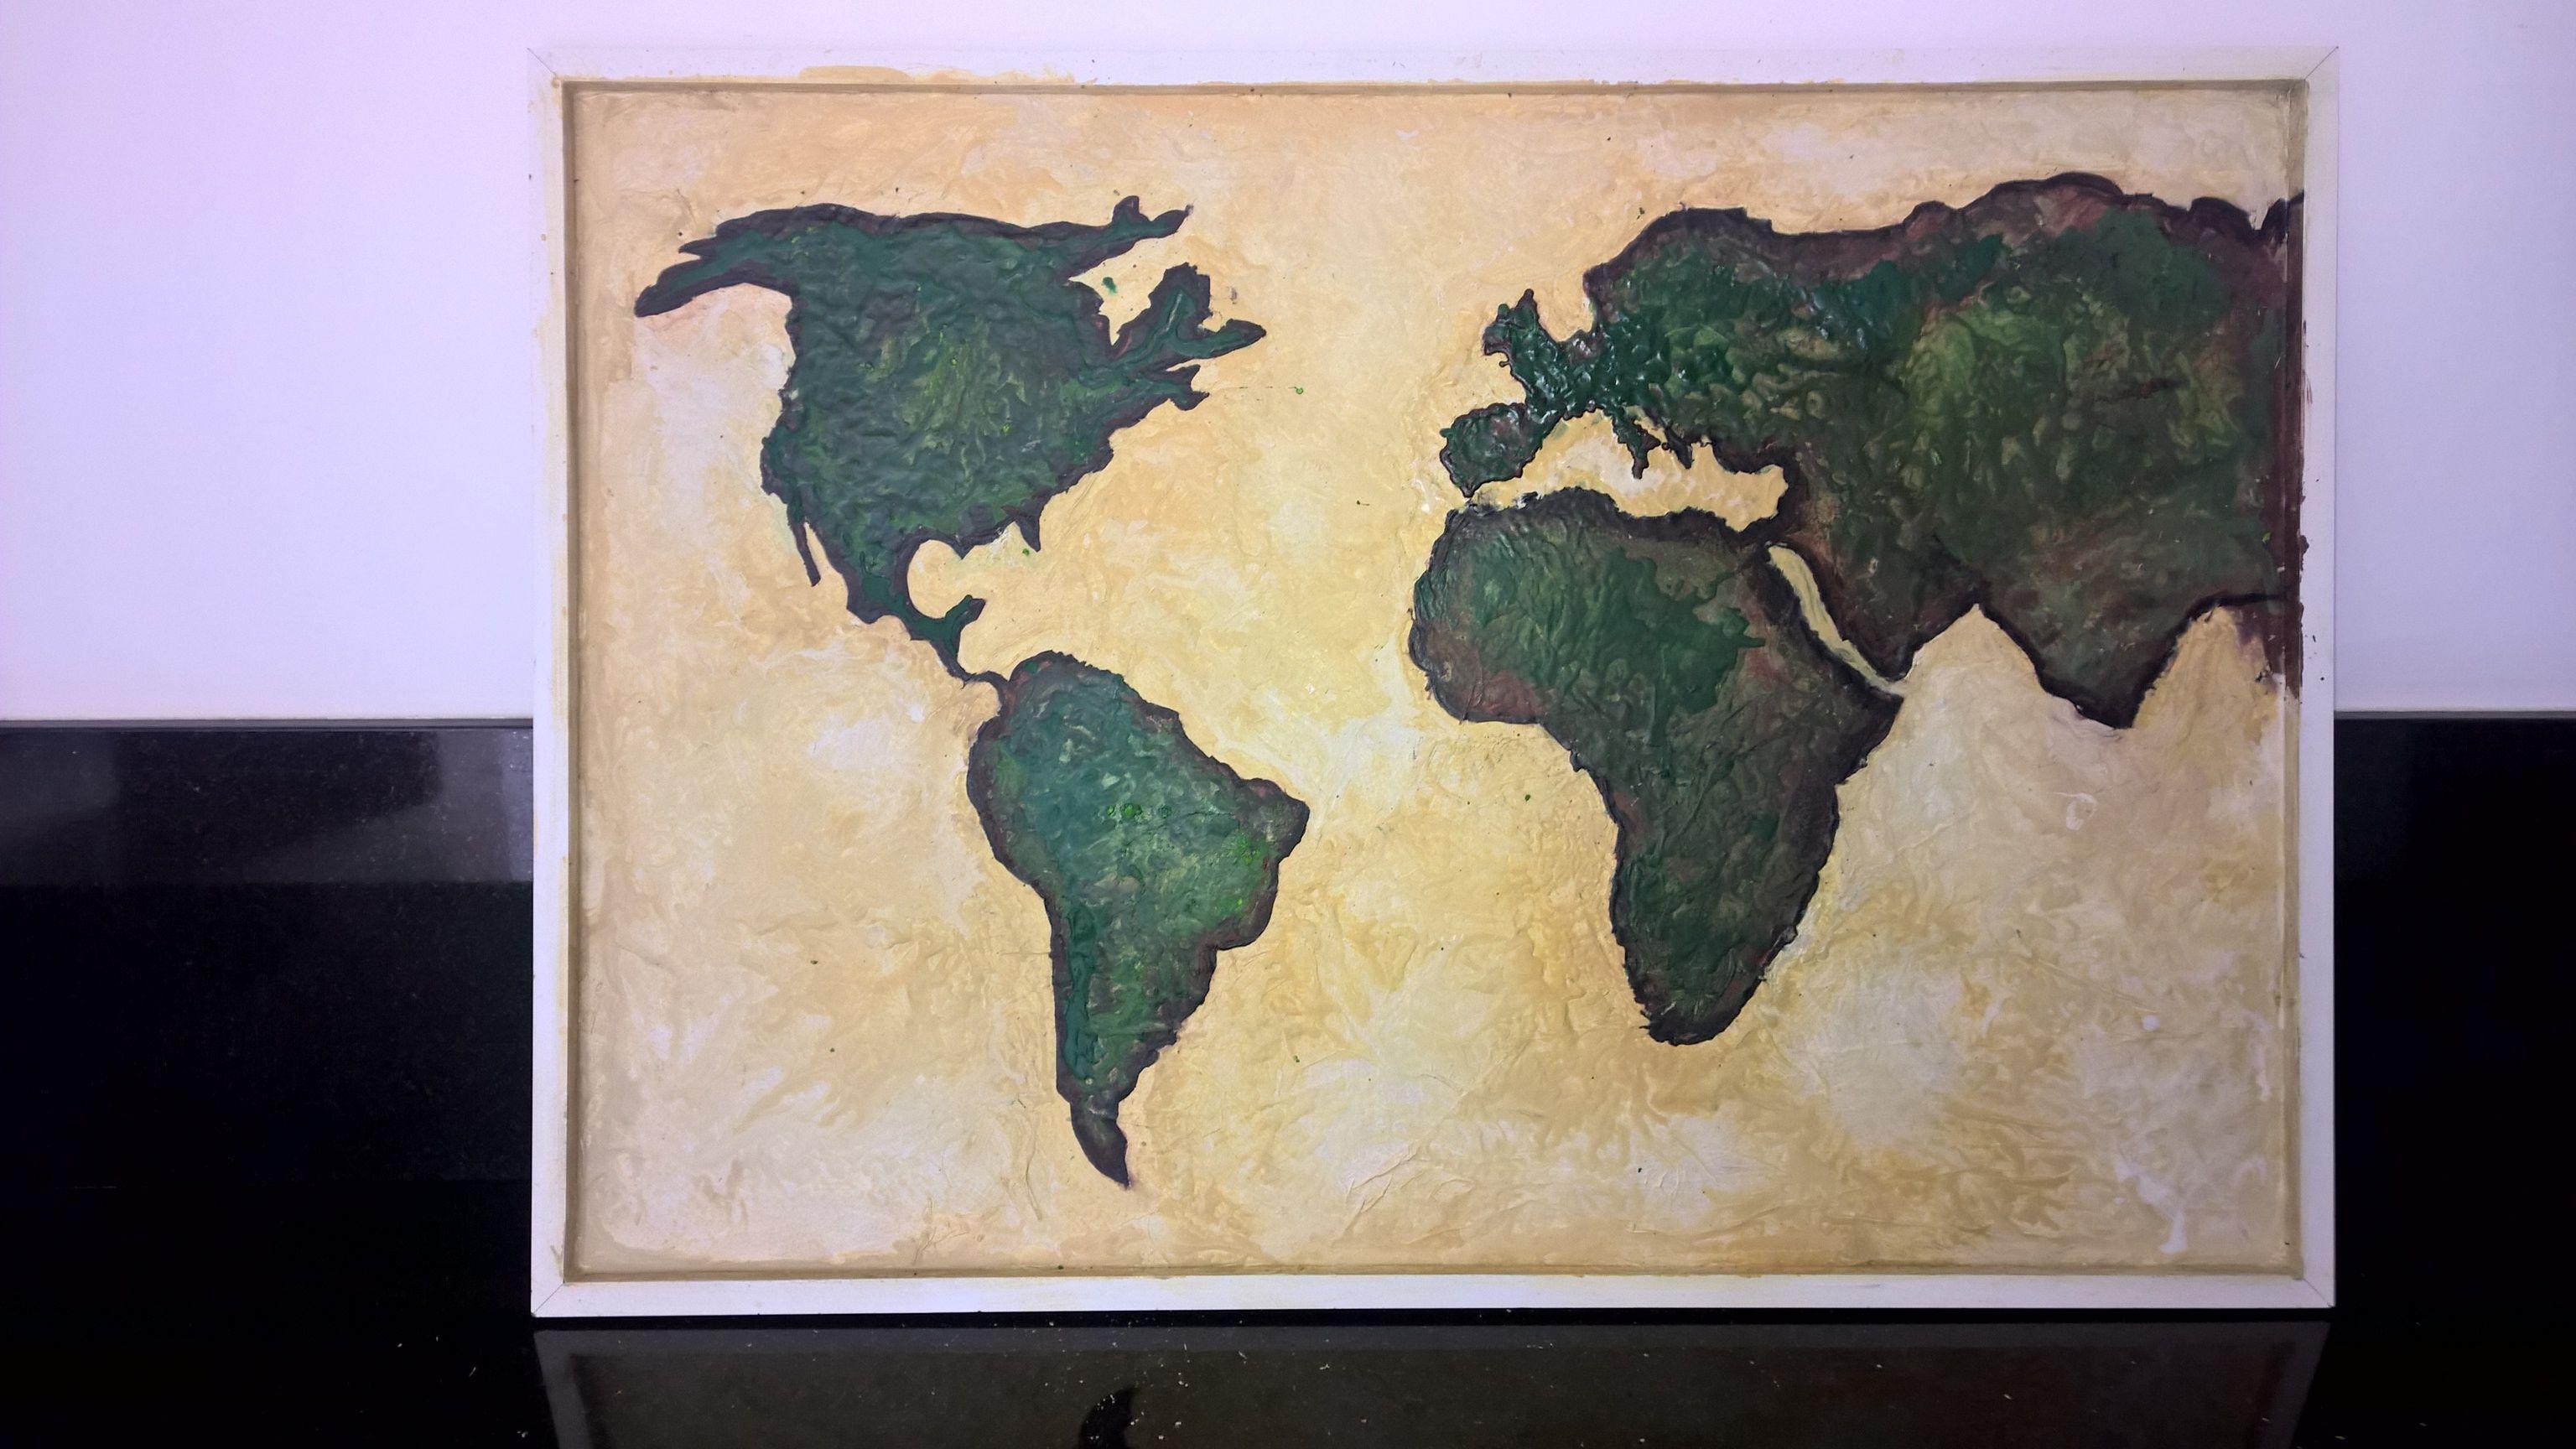 Diy crayon world map.